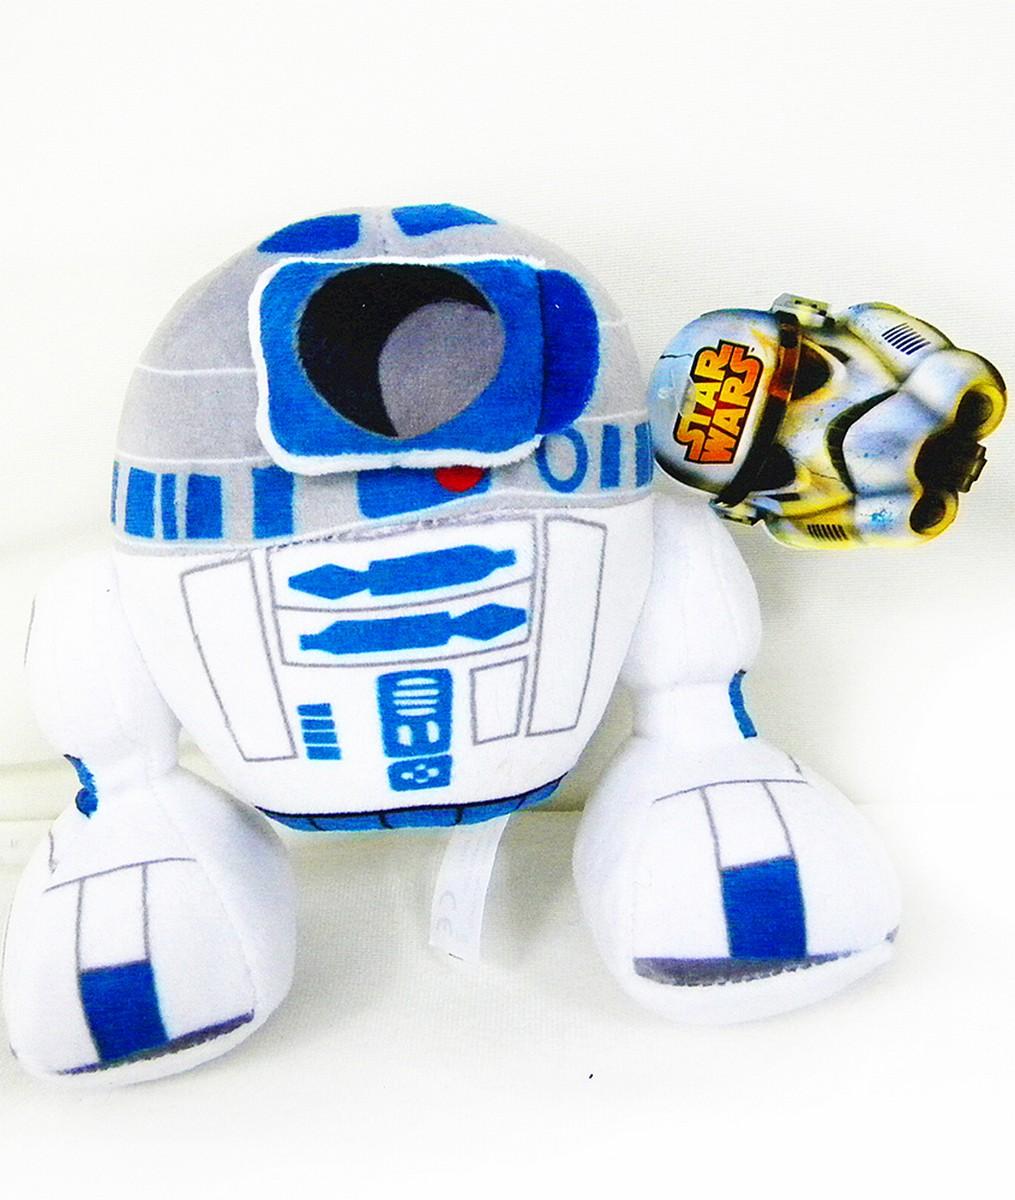 plyšová figúrka STAR WARS R2-D2, 17 cm